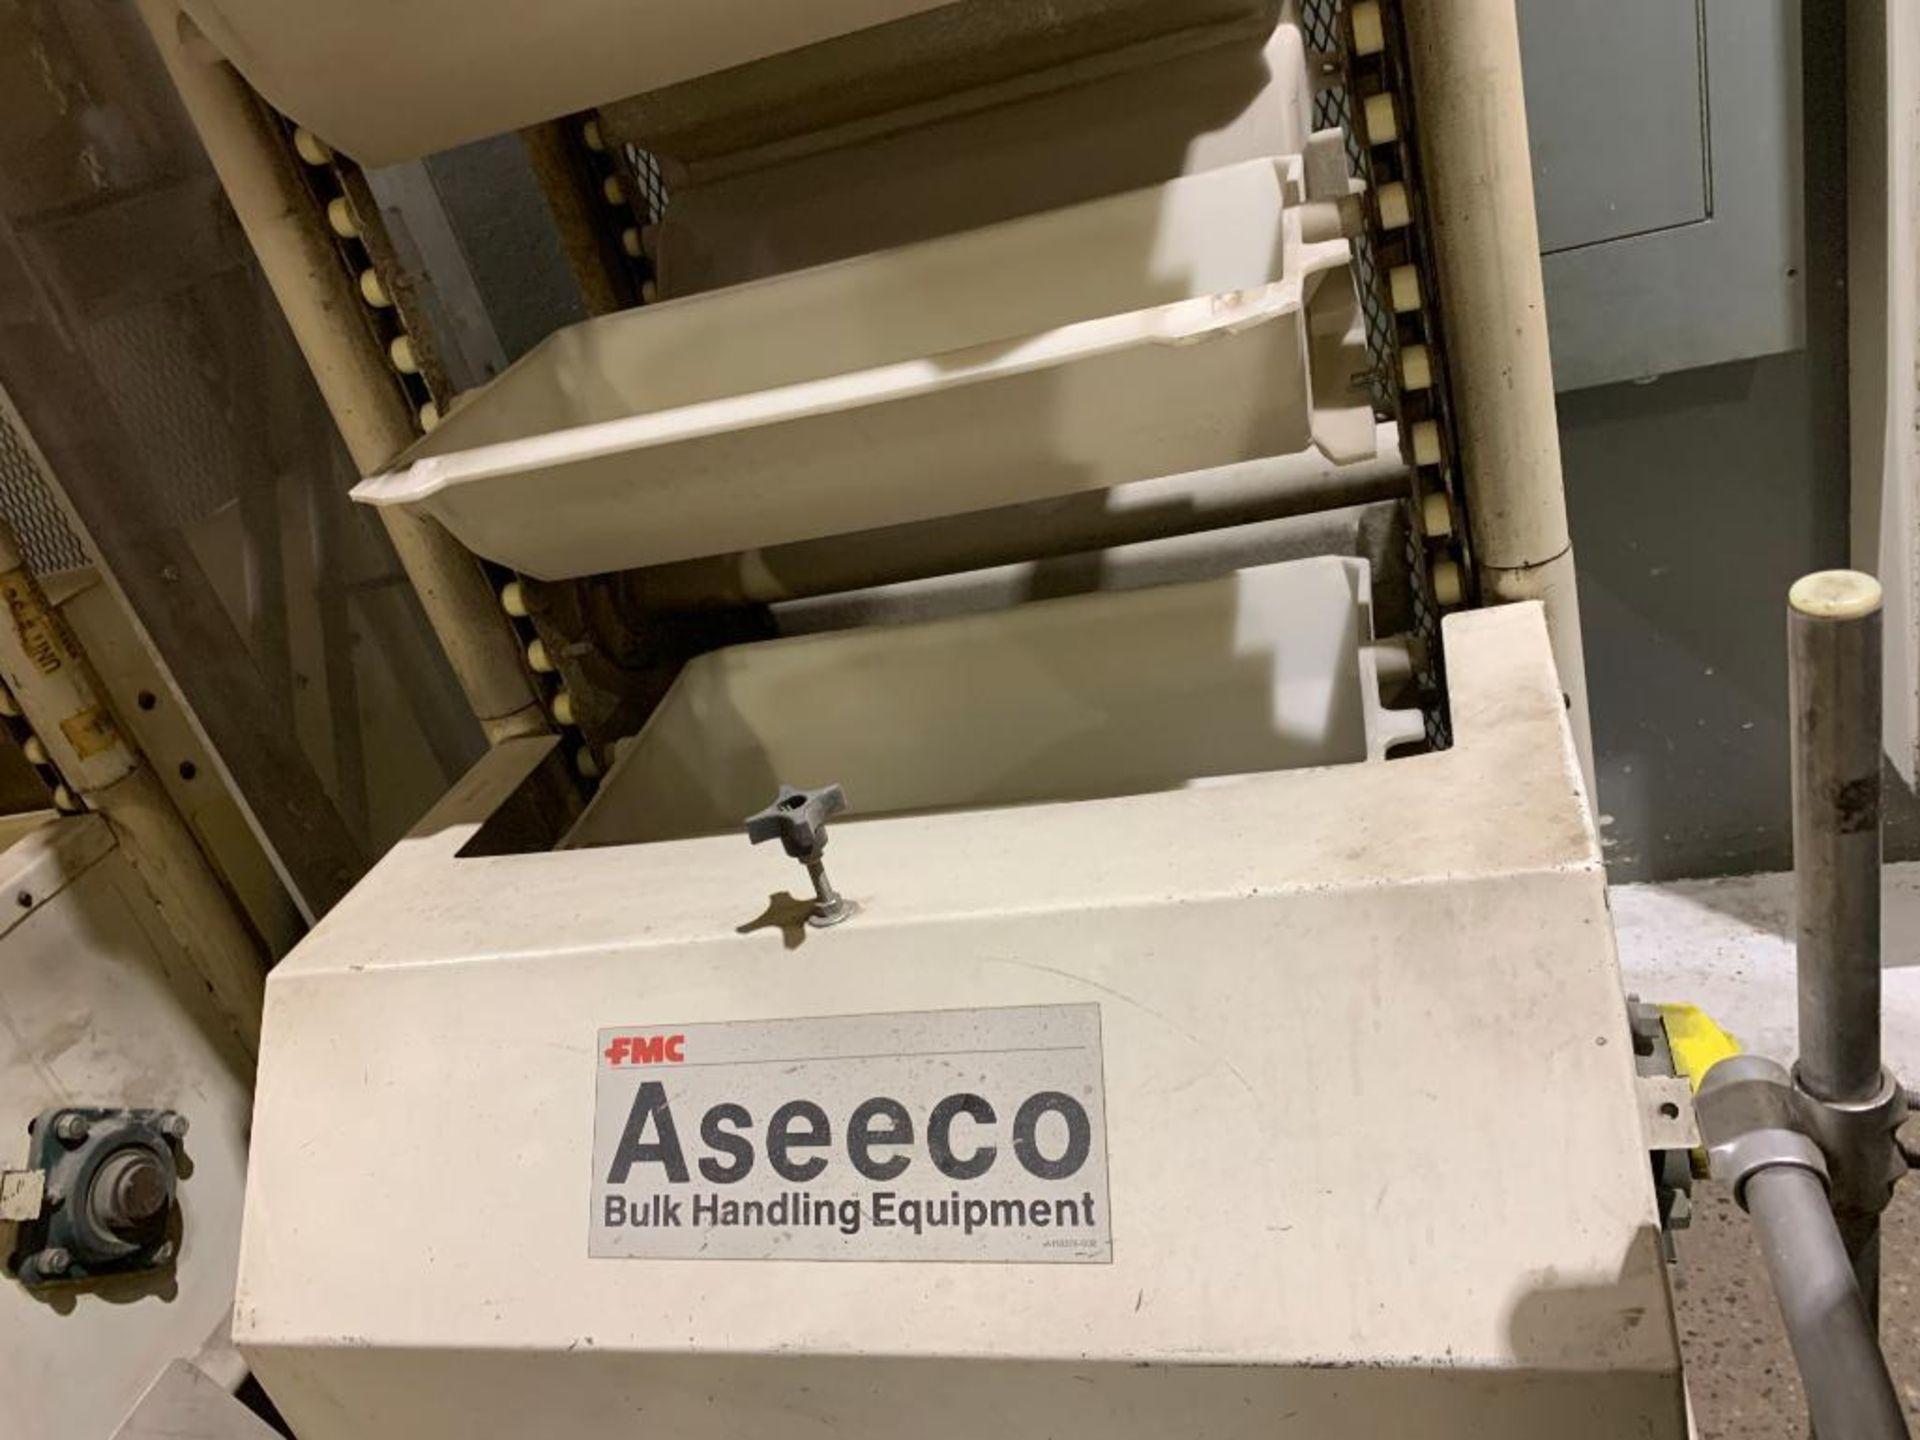 1992 Aseeco horizontal bucket elevator, model ALH-0-24-CP - Image 9 of 18